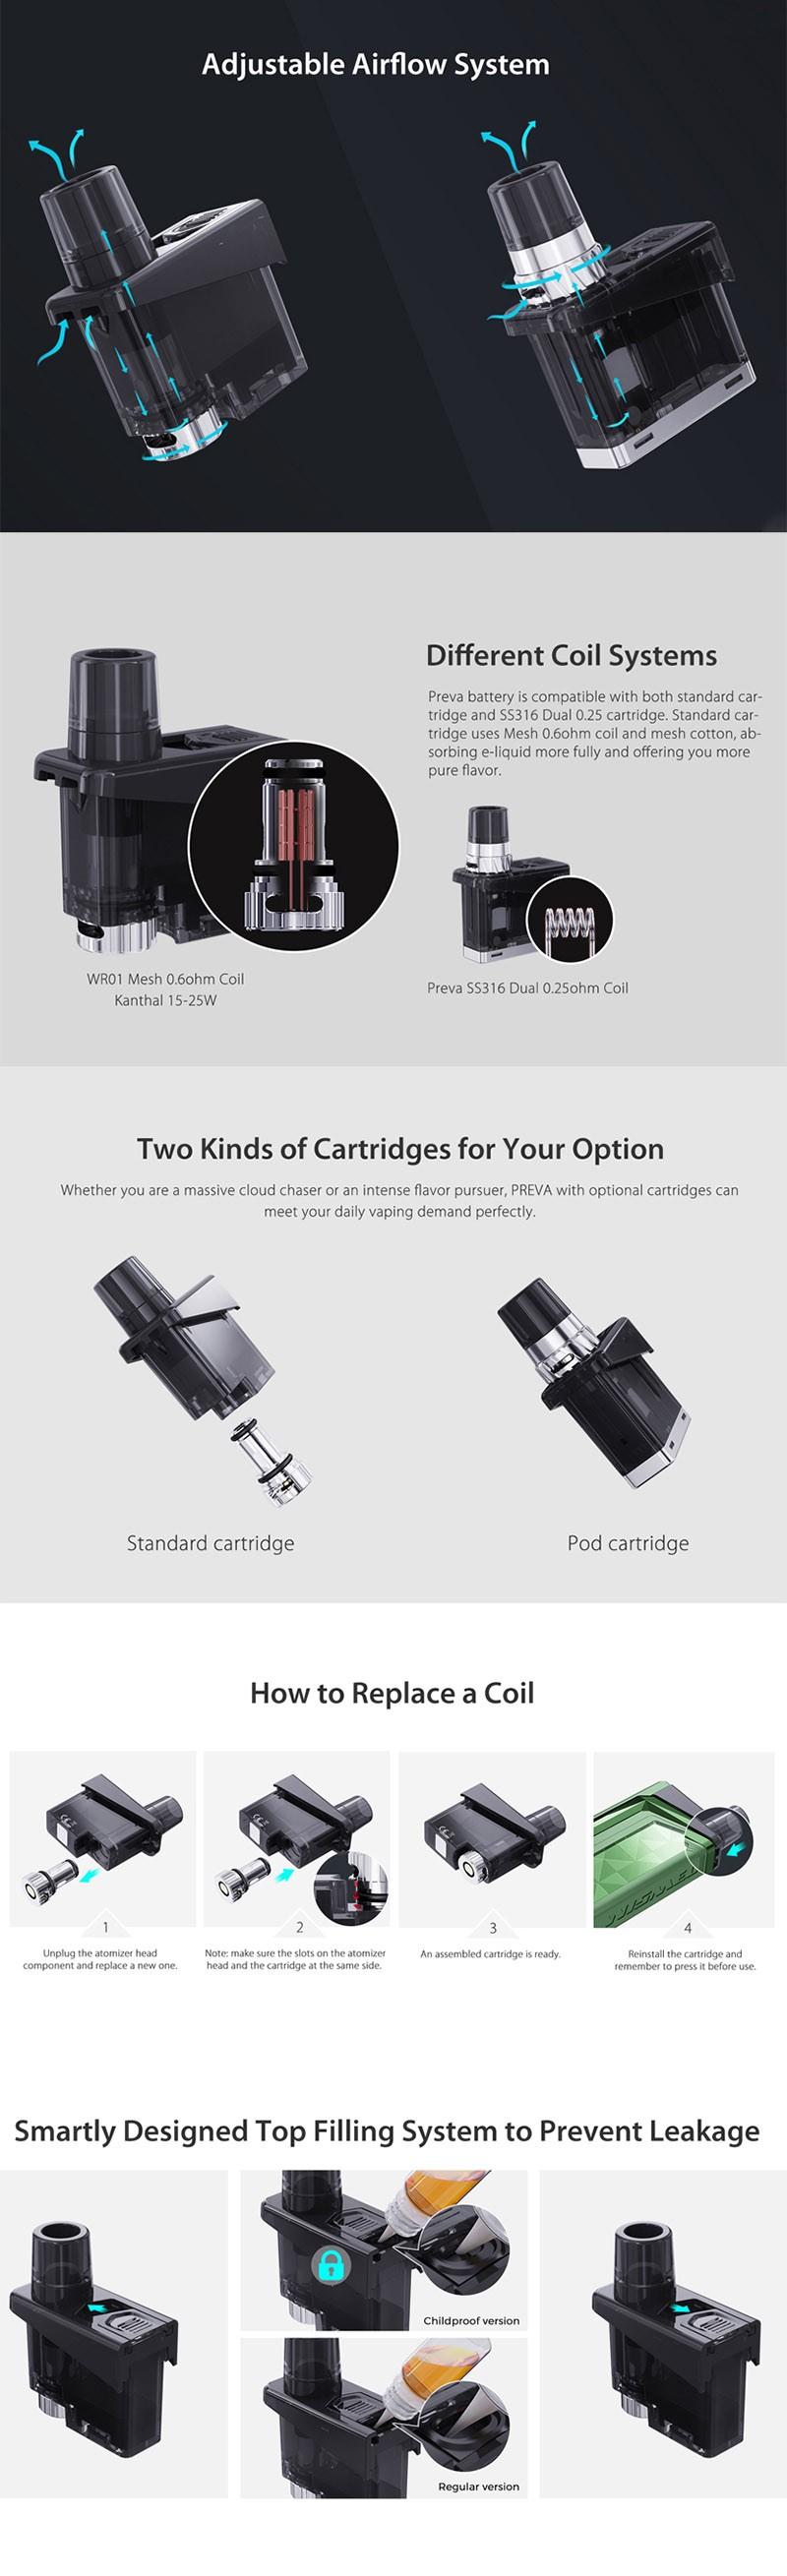 WISMEC Preva Kit Replacement Pod Cartridge